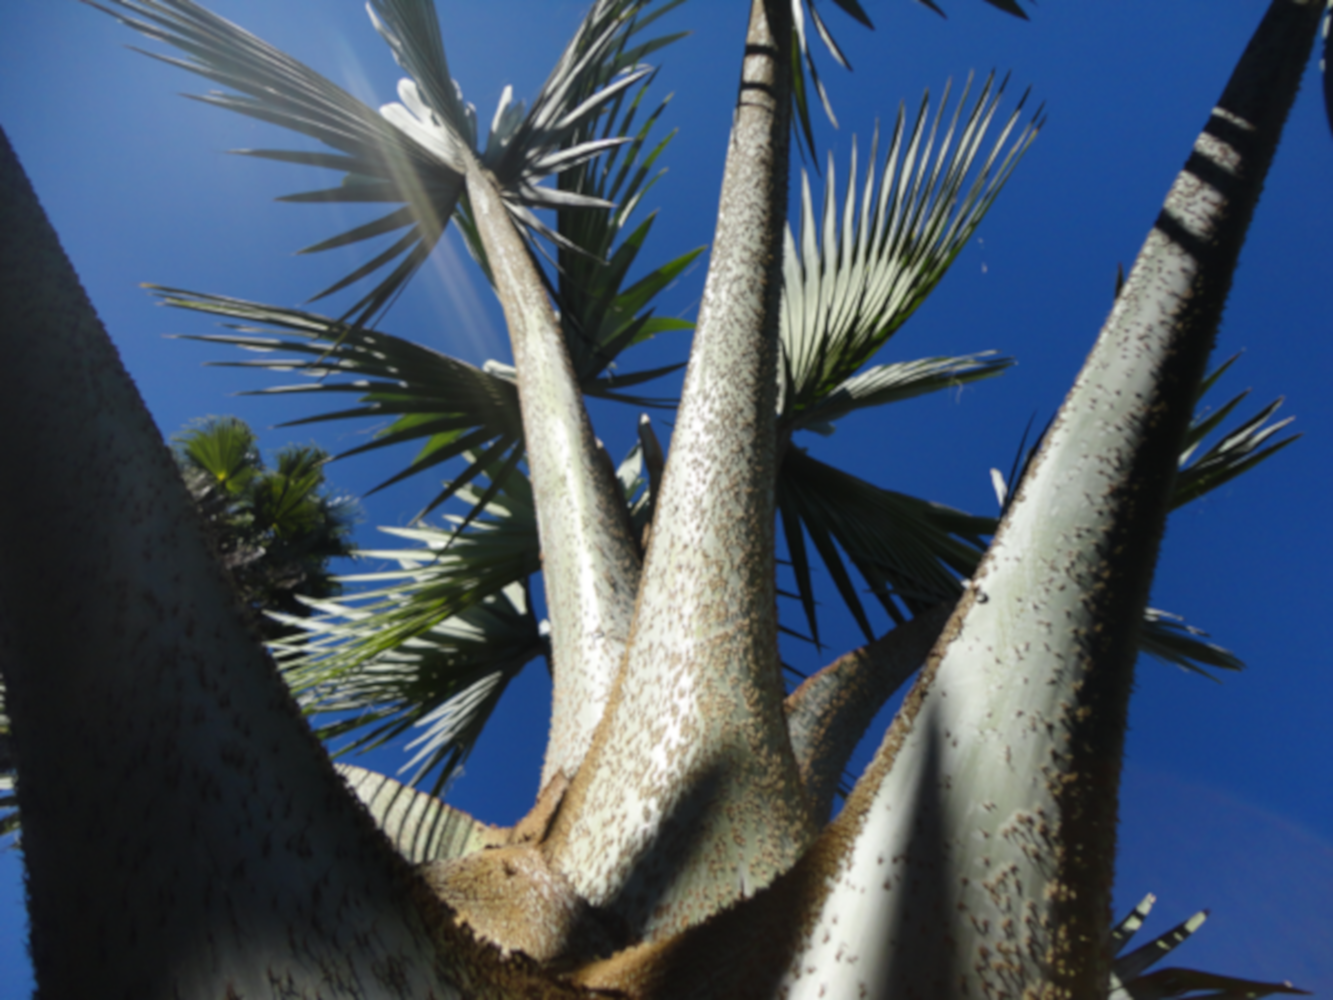 Bismarck Palm petioles